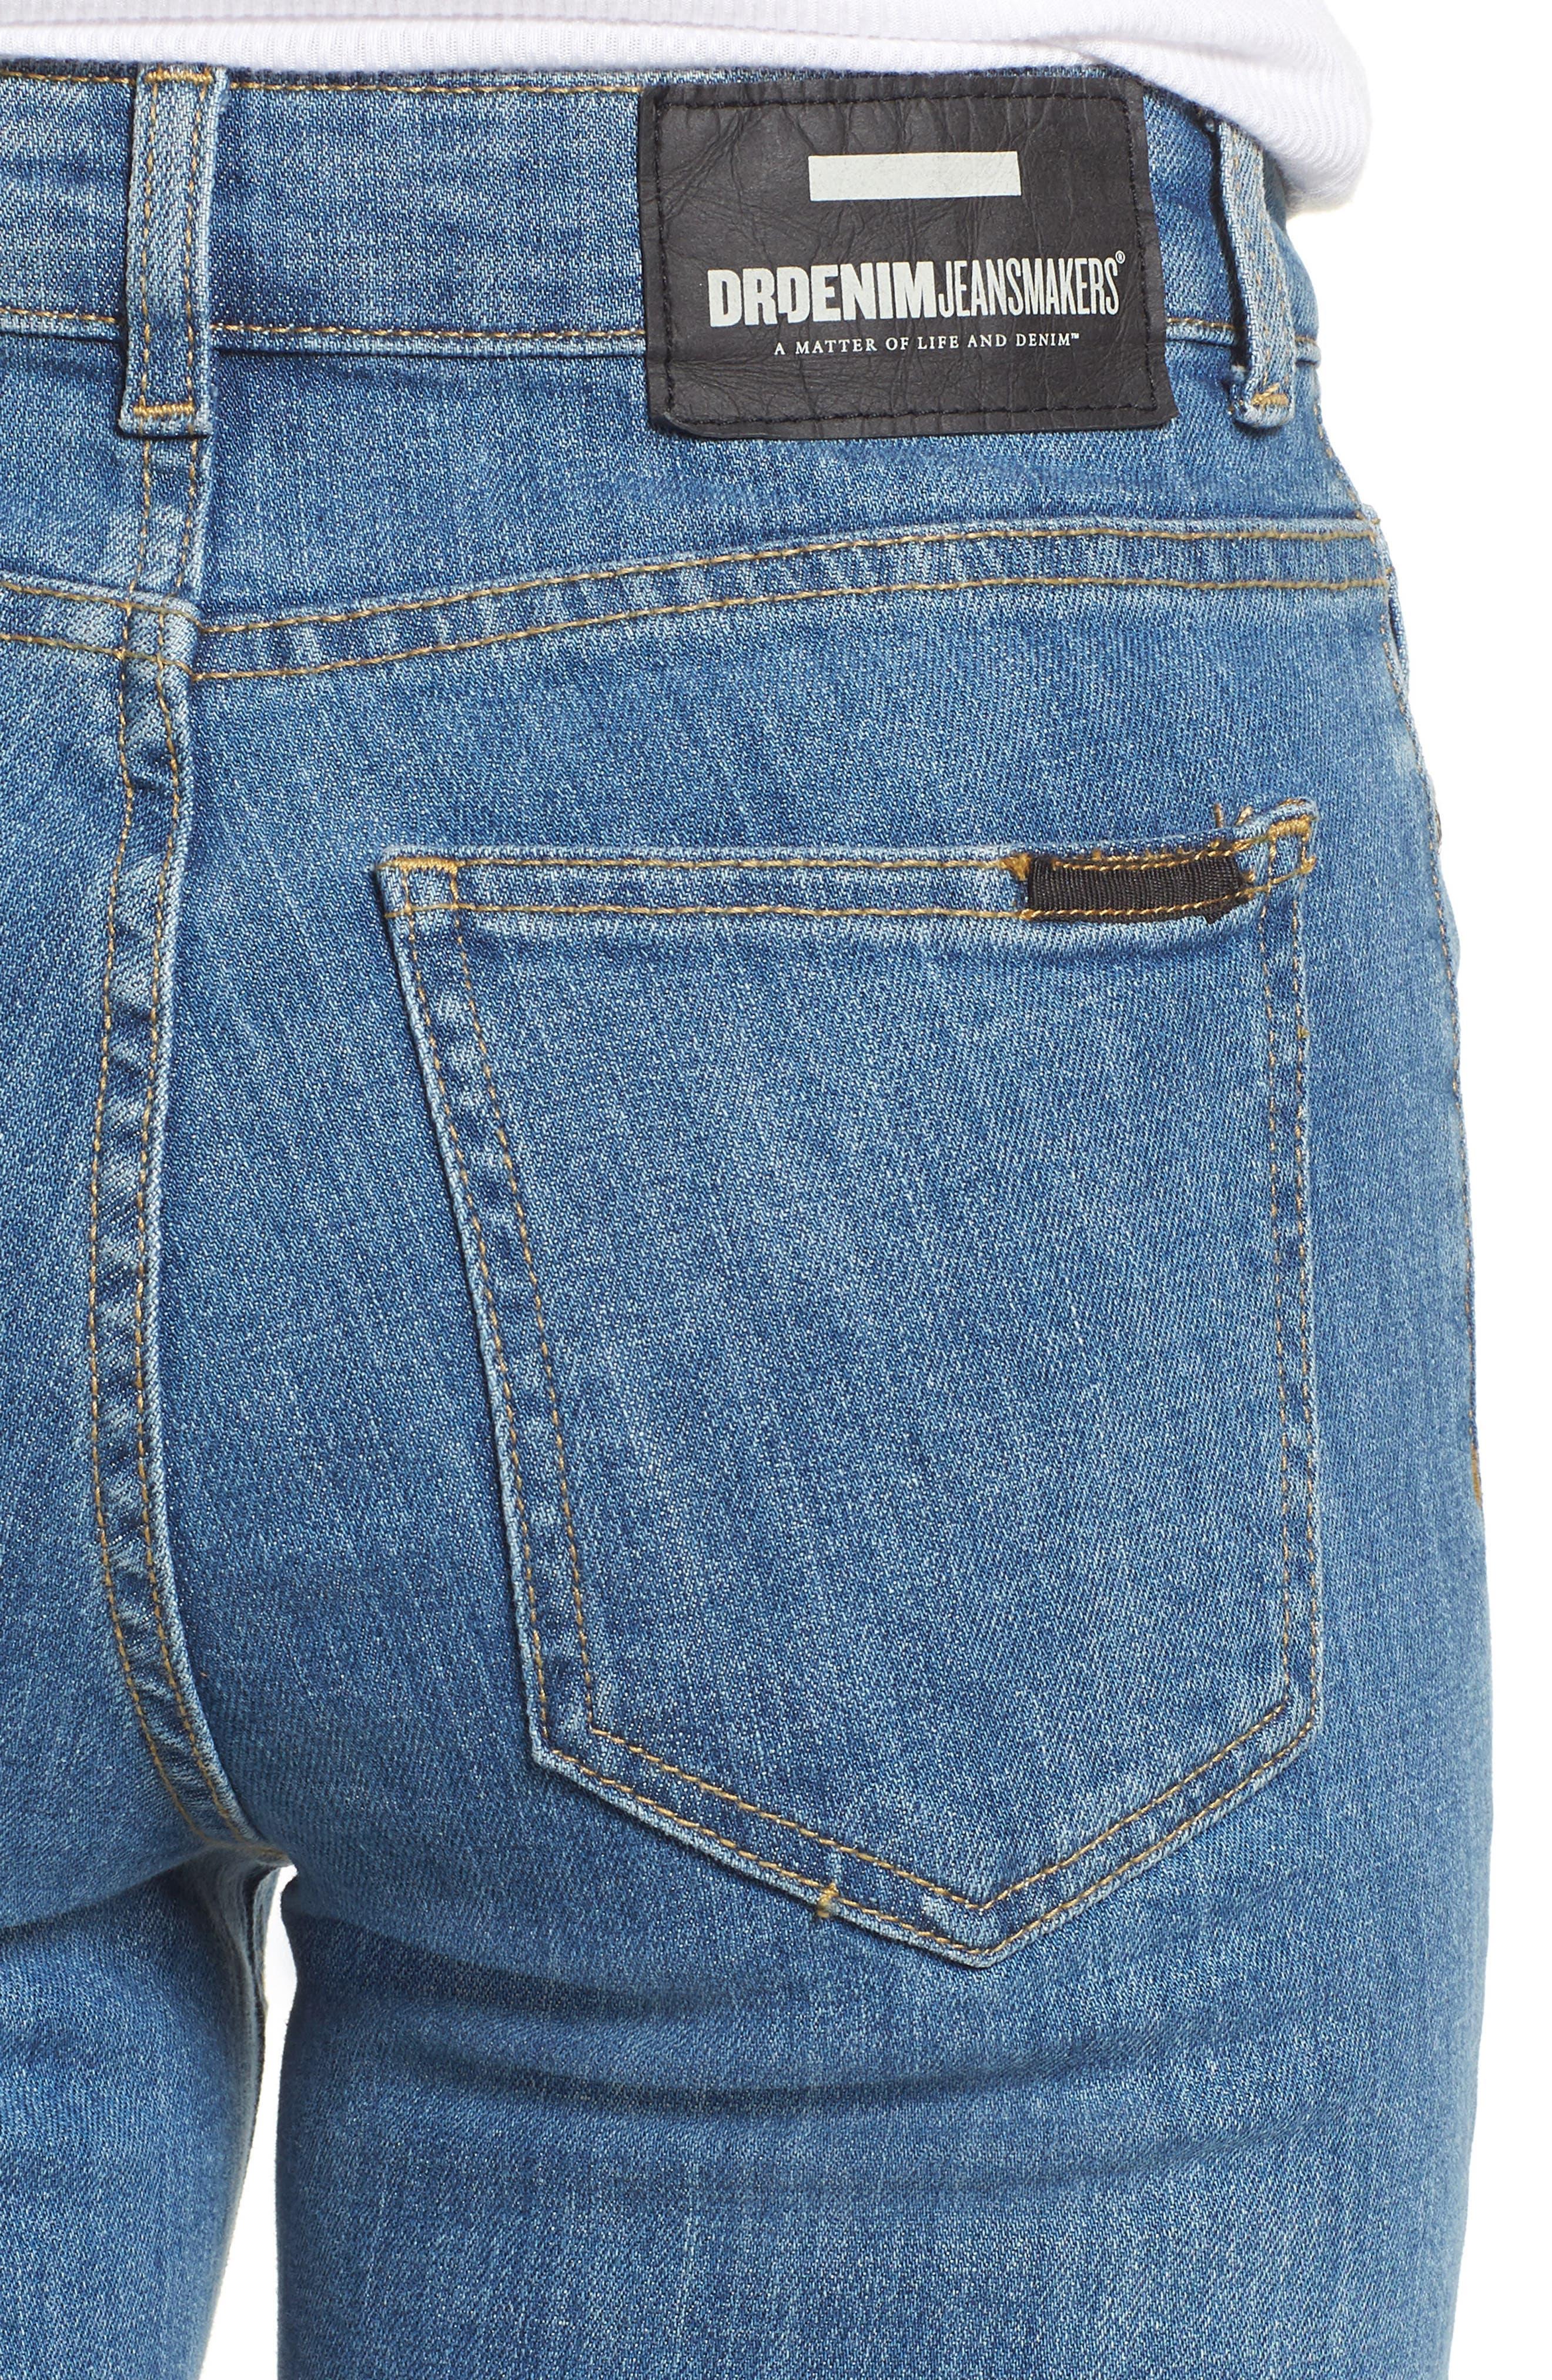 Edie High Waist Crop Jeans,                             Alternate thumbnail 4, color,                             400